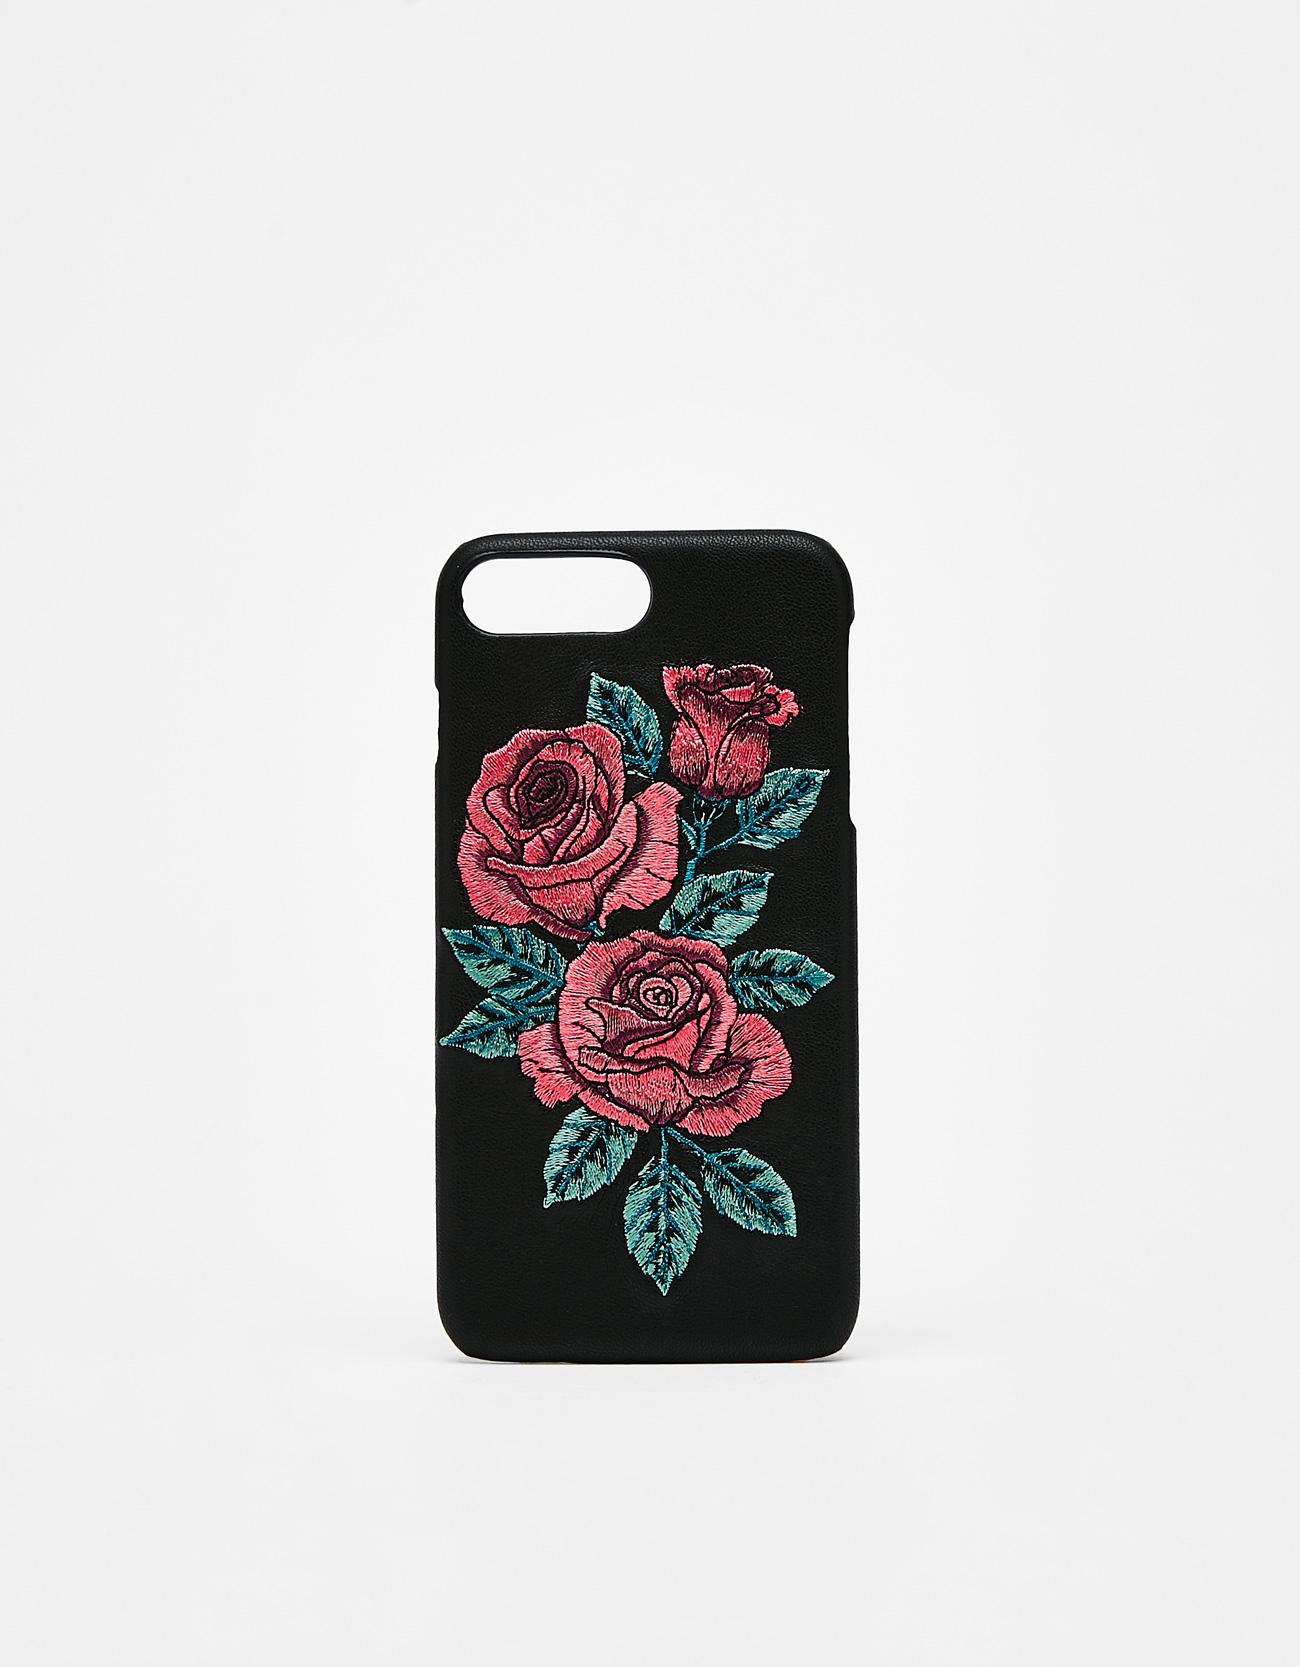 cover iphone 5 bershka